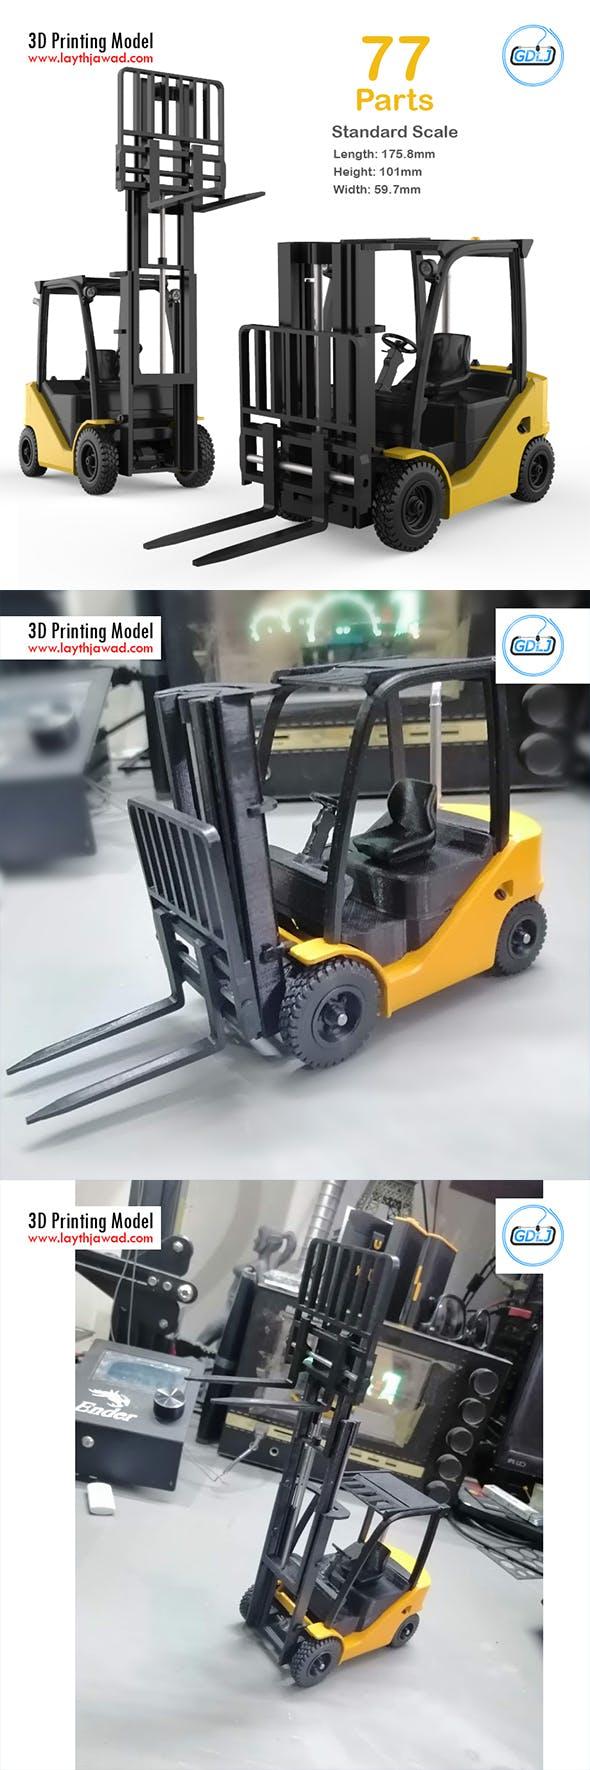 Clark S20 53 Forklift Truck - 3D Printing Model - 3DOcean Item for Sale